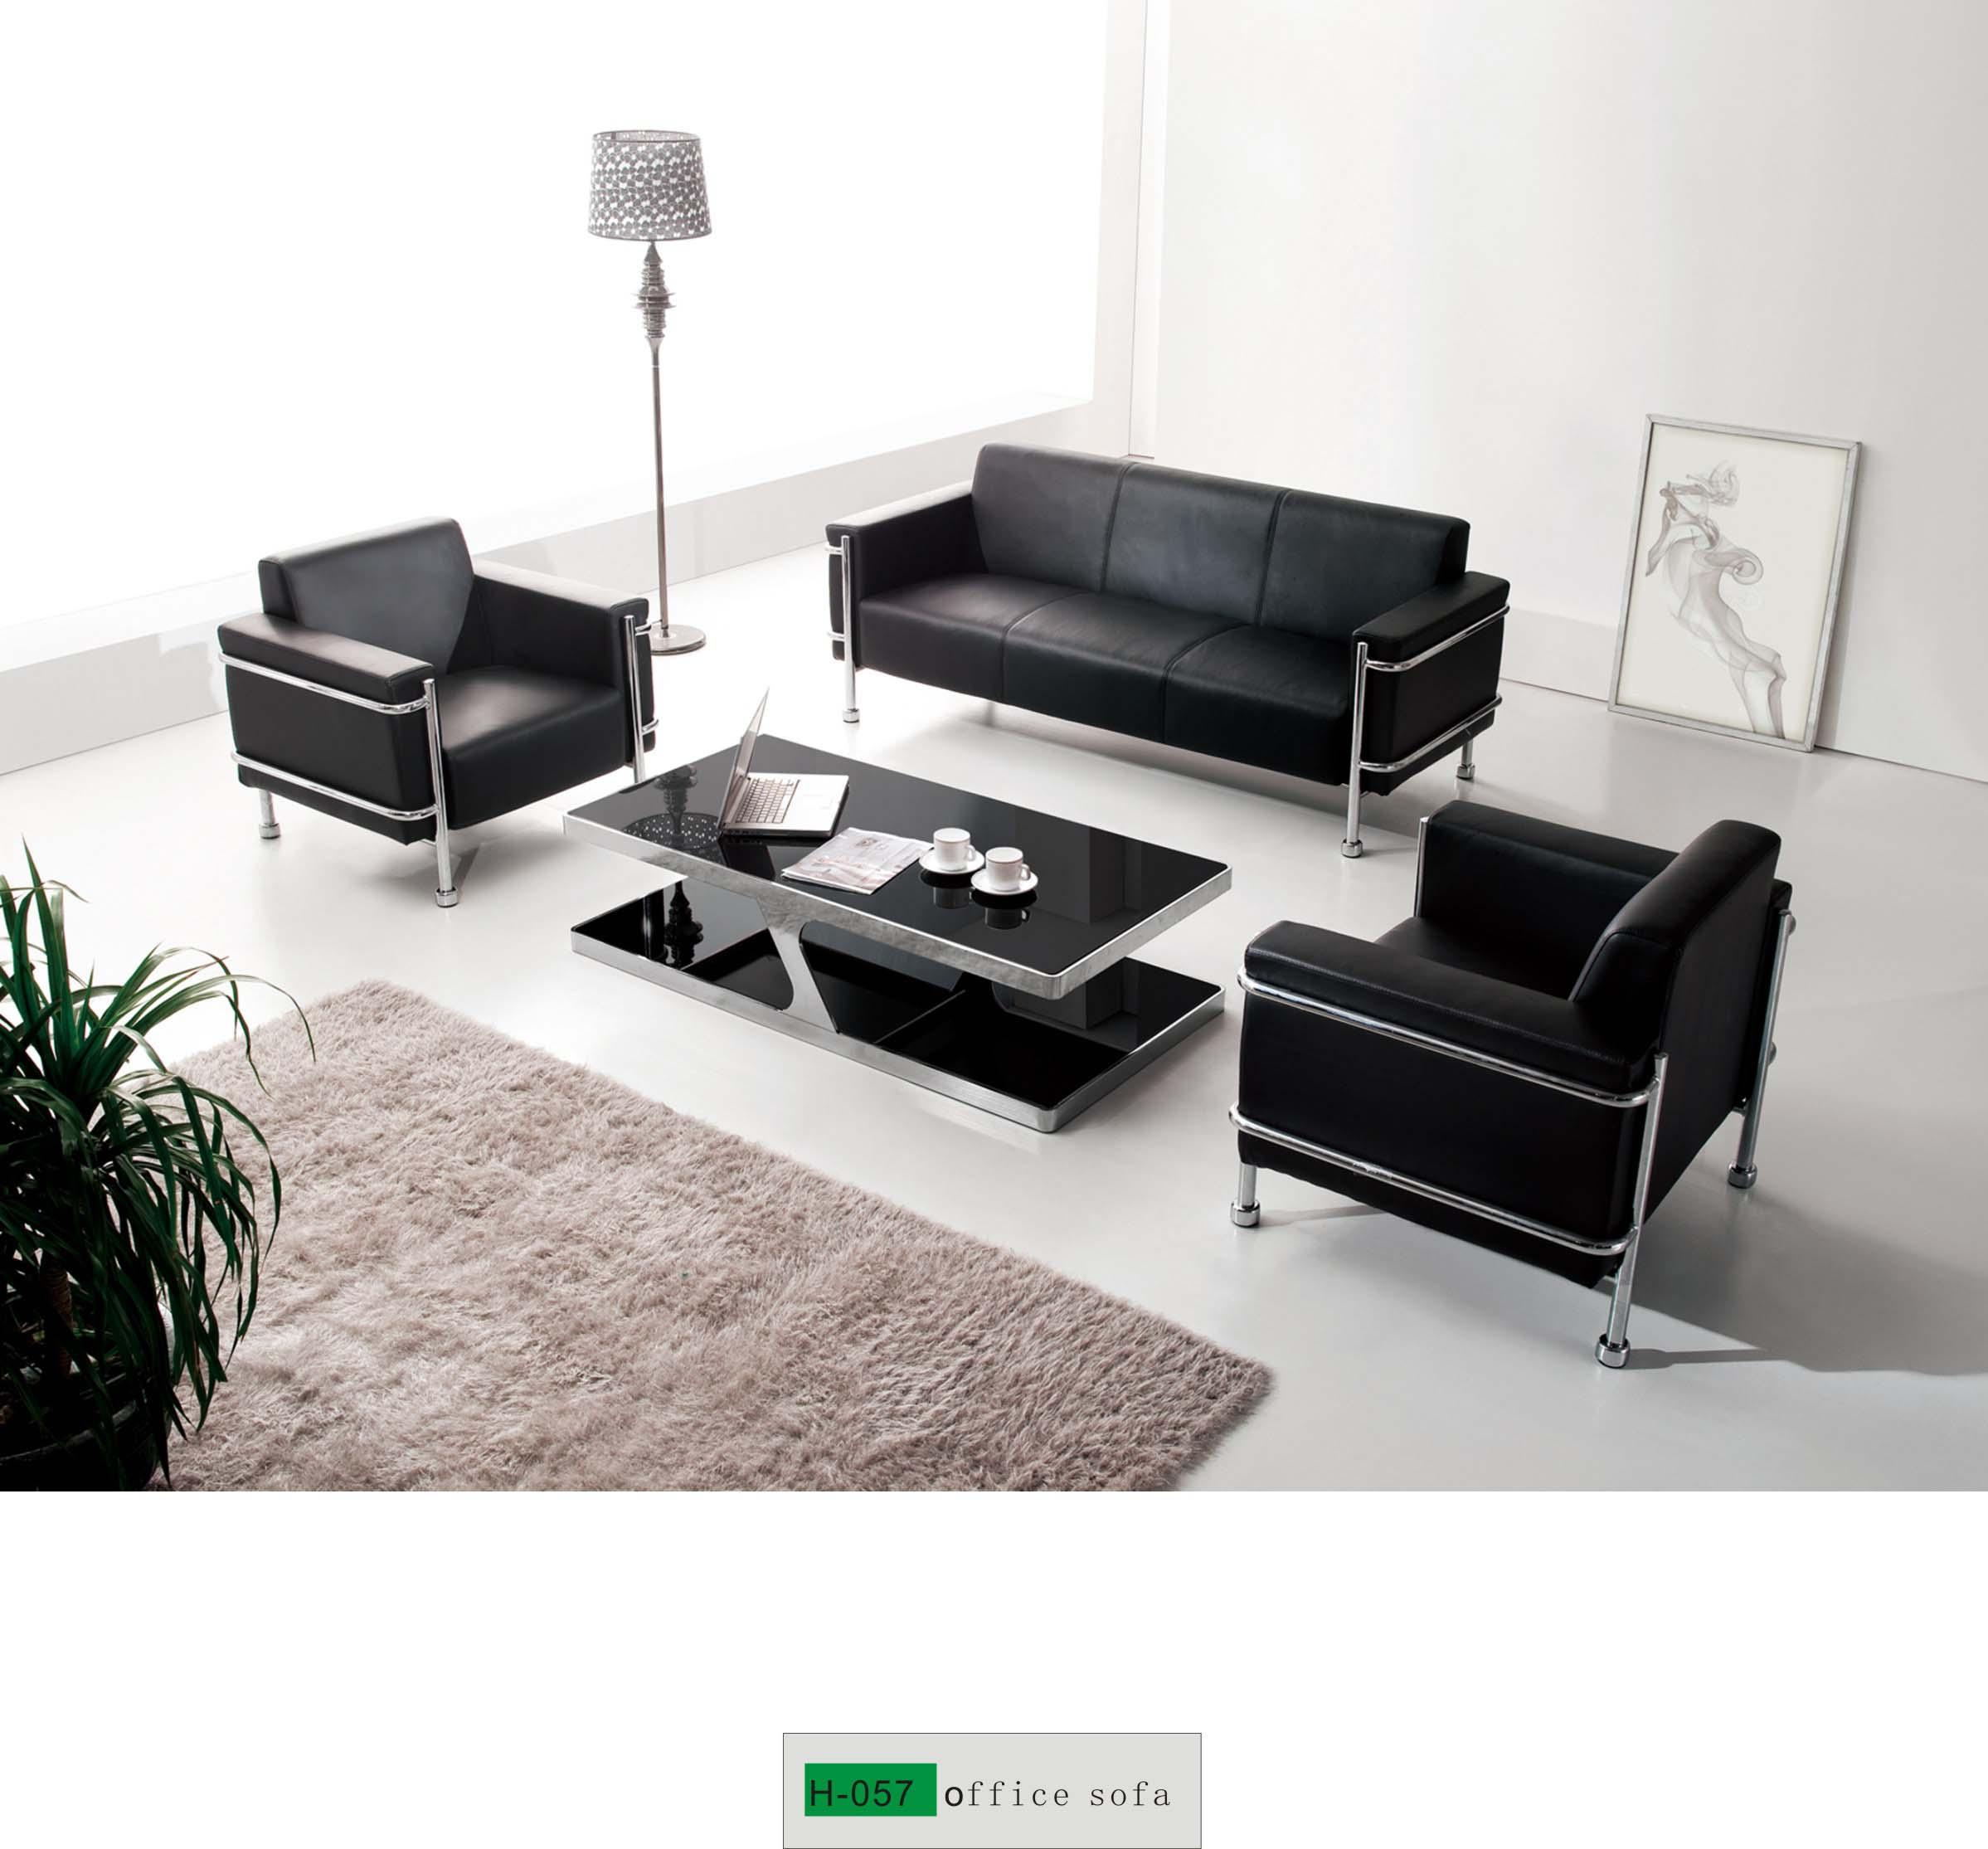 Modern Office Sofa H-057 - Buy black office sofa, commercial ...